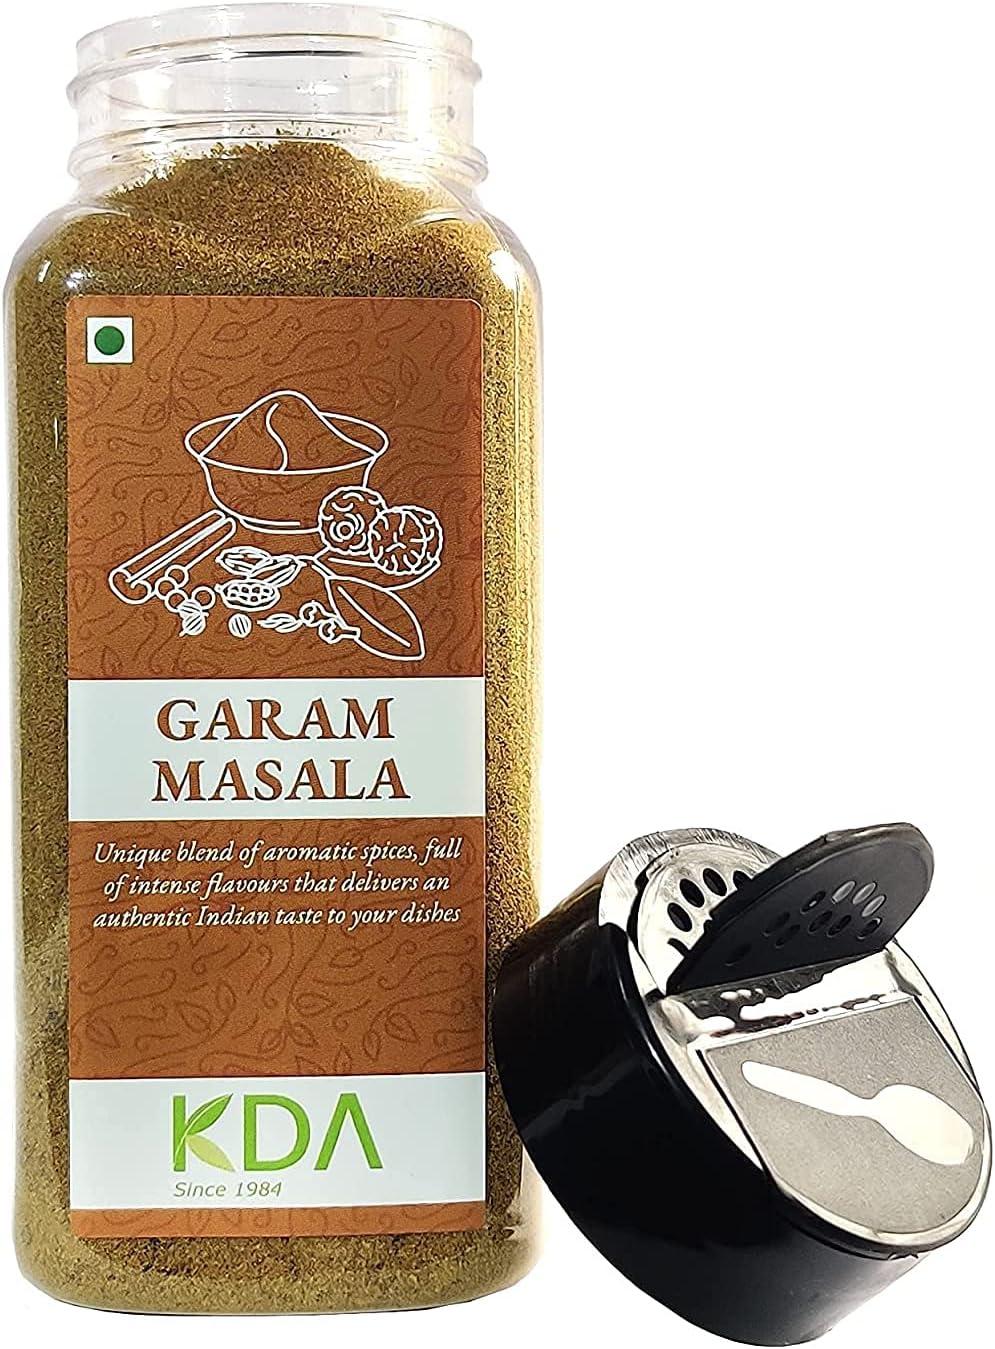 Gannon Fashion KDA Garam Masala 125g Spice Mix Authentic Challenge the lowest price